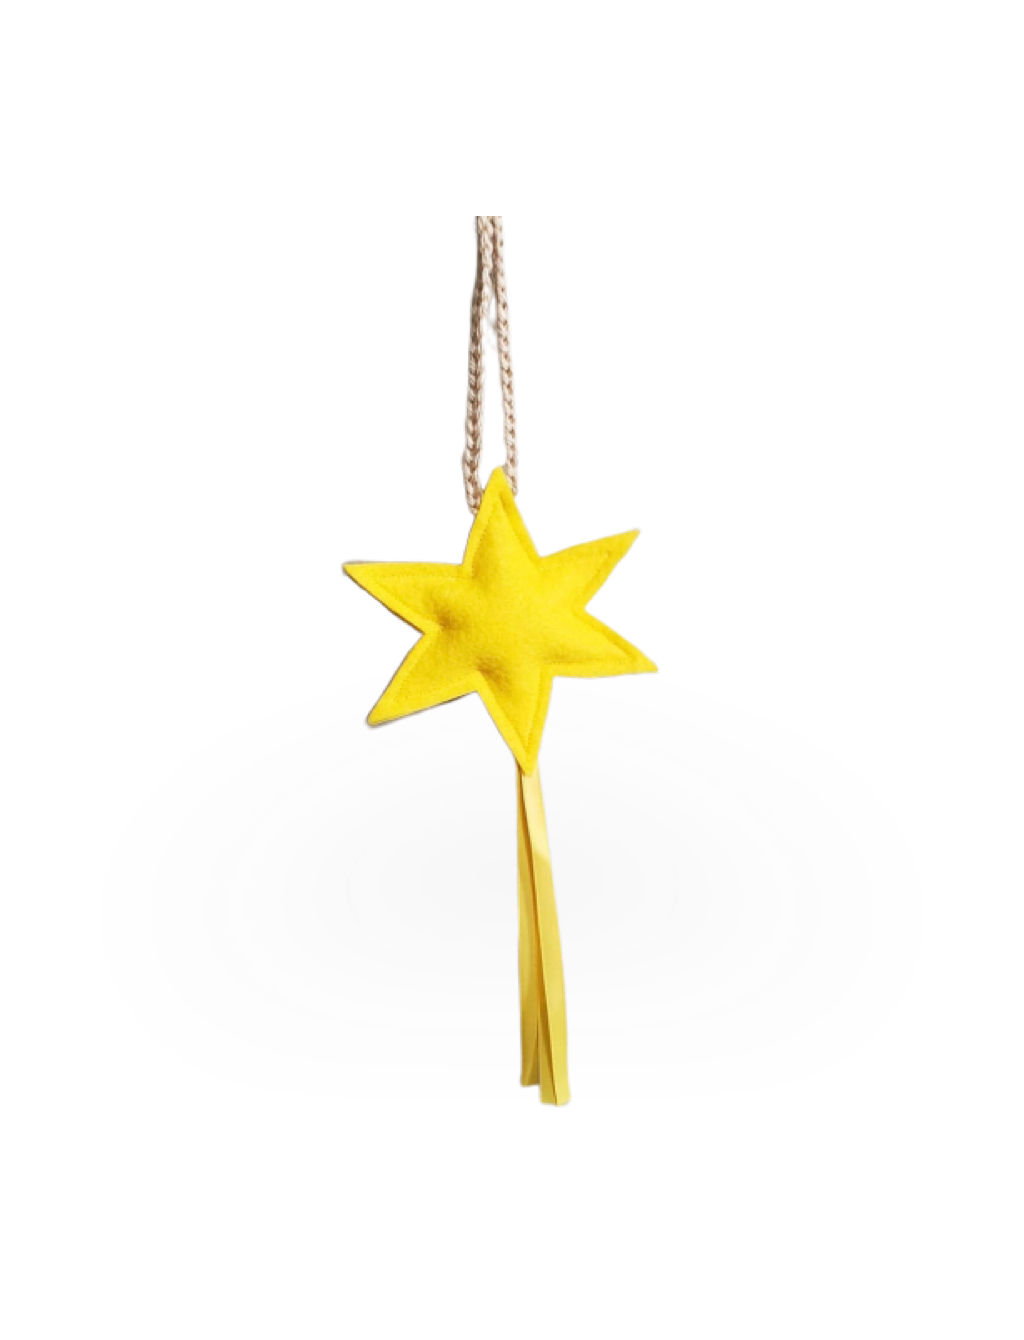 Star Teaser Toy